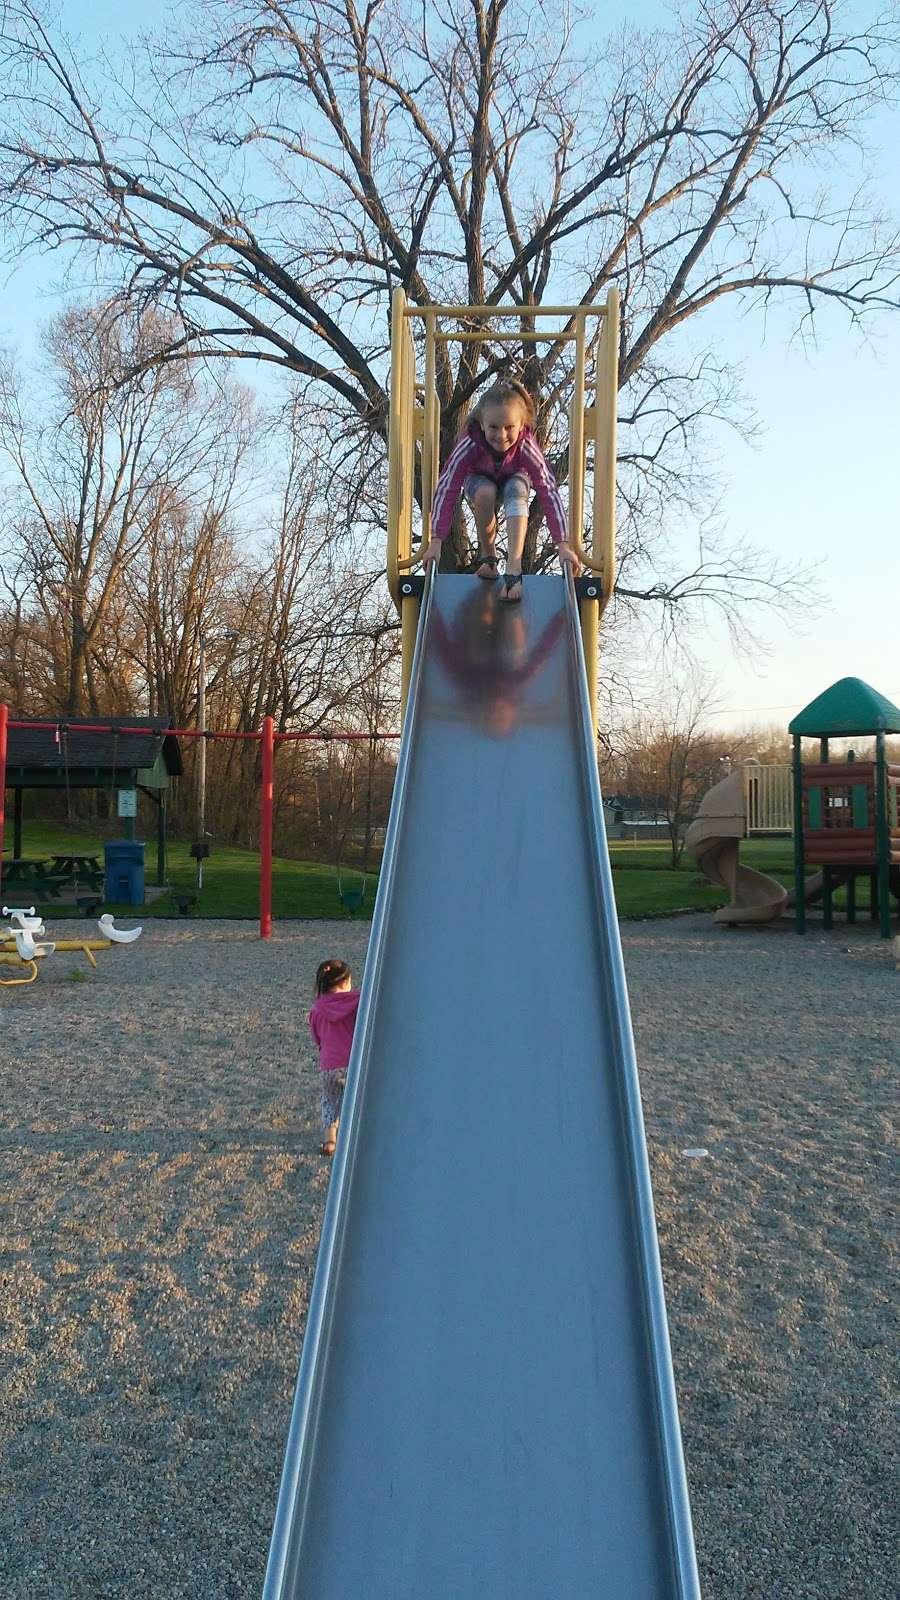 Jonesboro Community Park - park  | Photo 6 of 10 | Address: 708 Fairmount Ave, Jonesboro, IN 46938, USA | Phone: (765) 674-1196